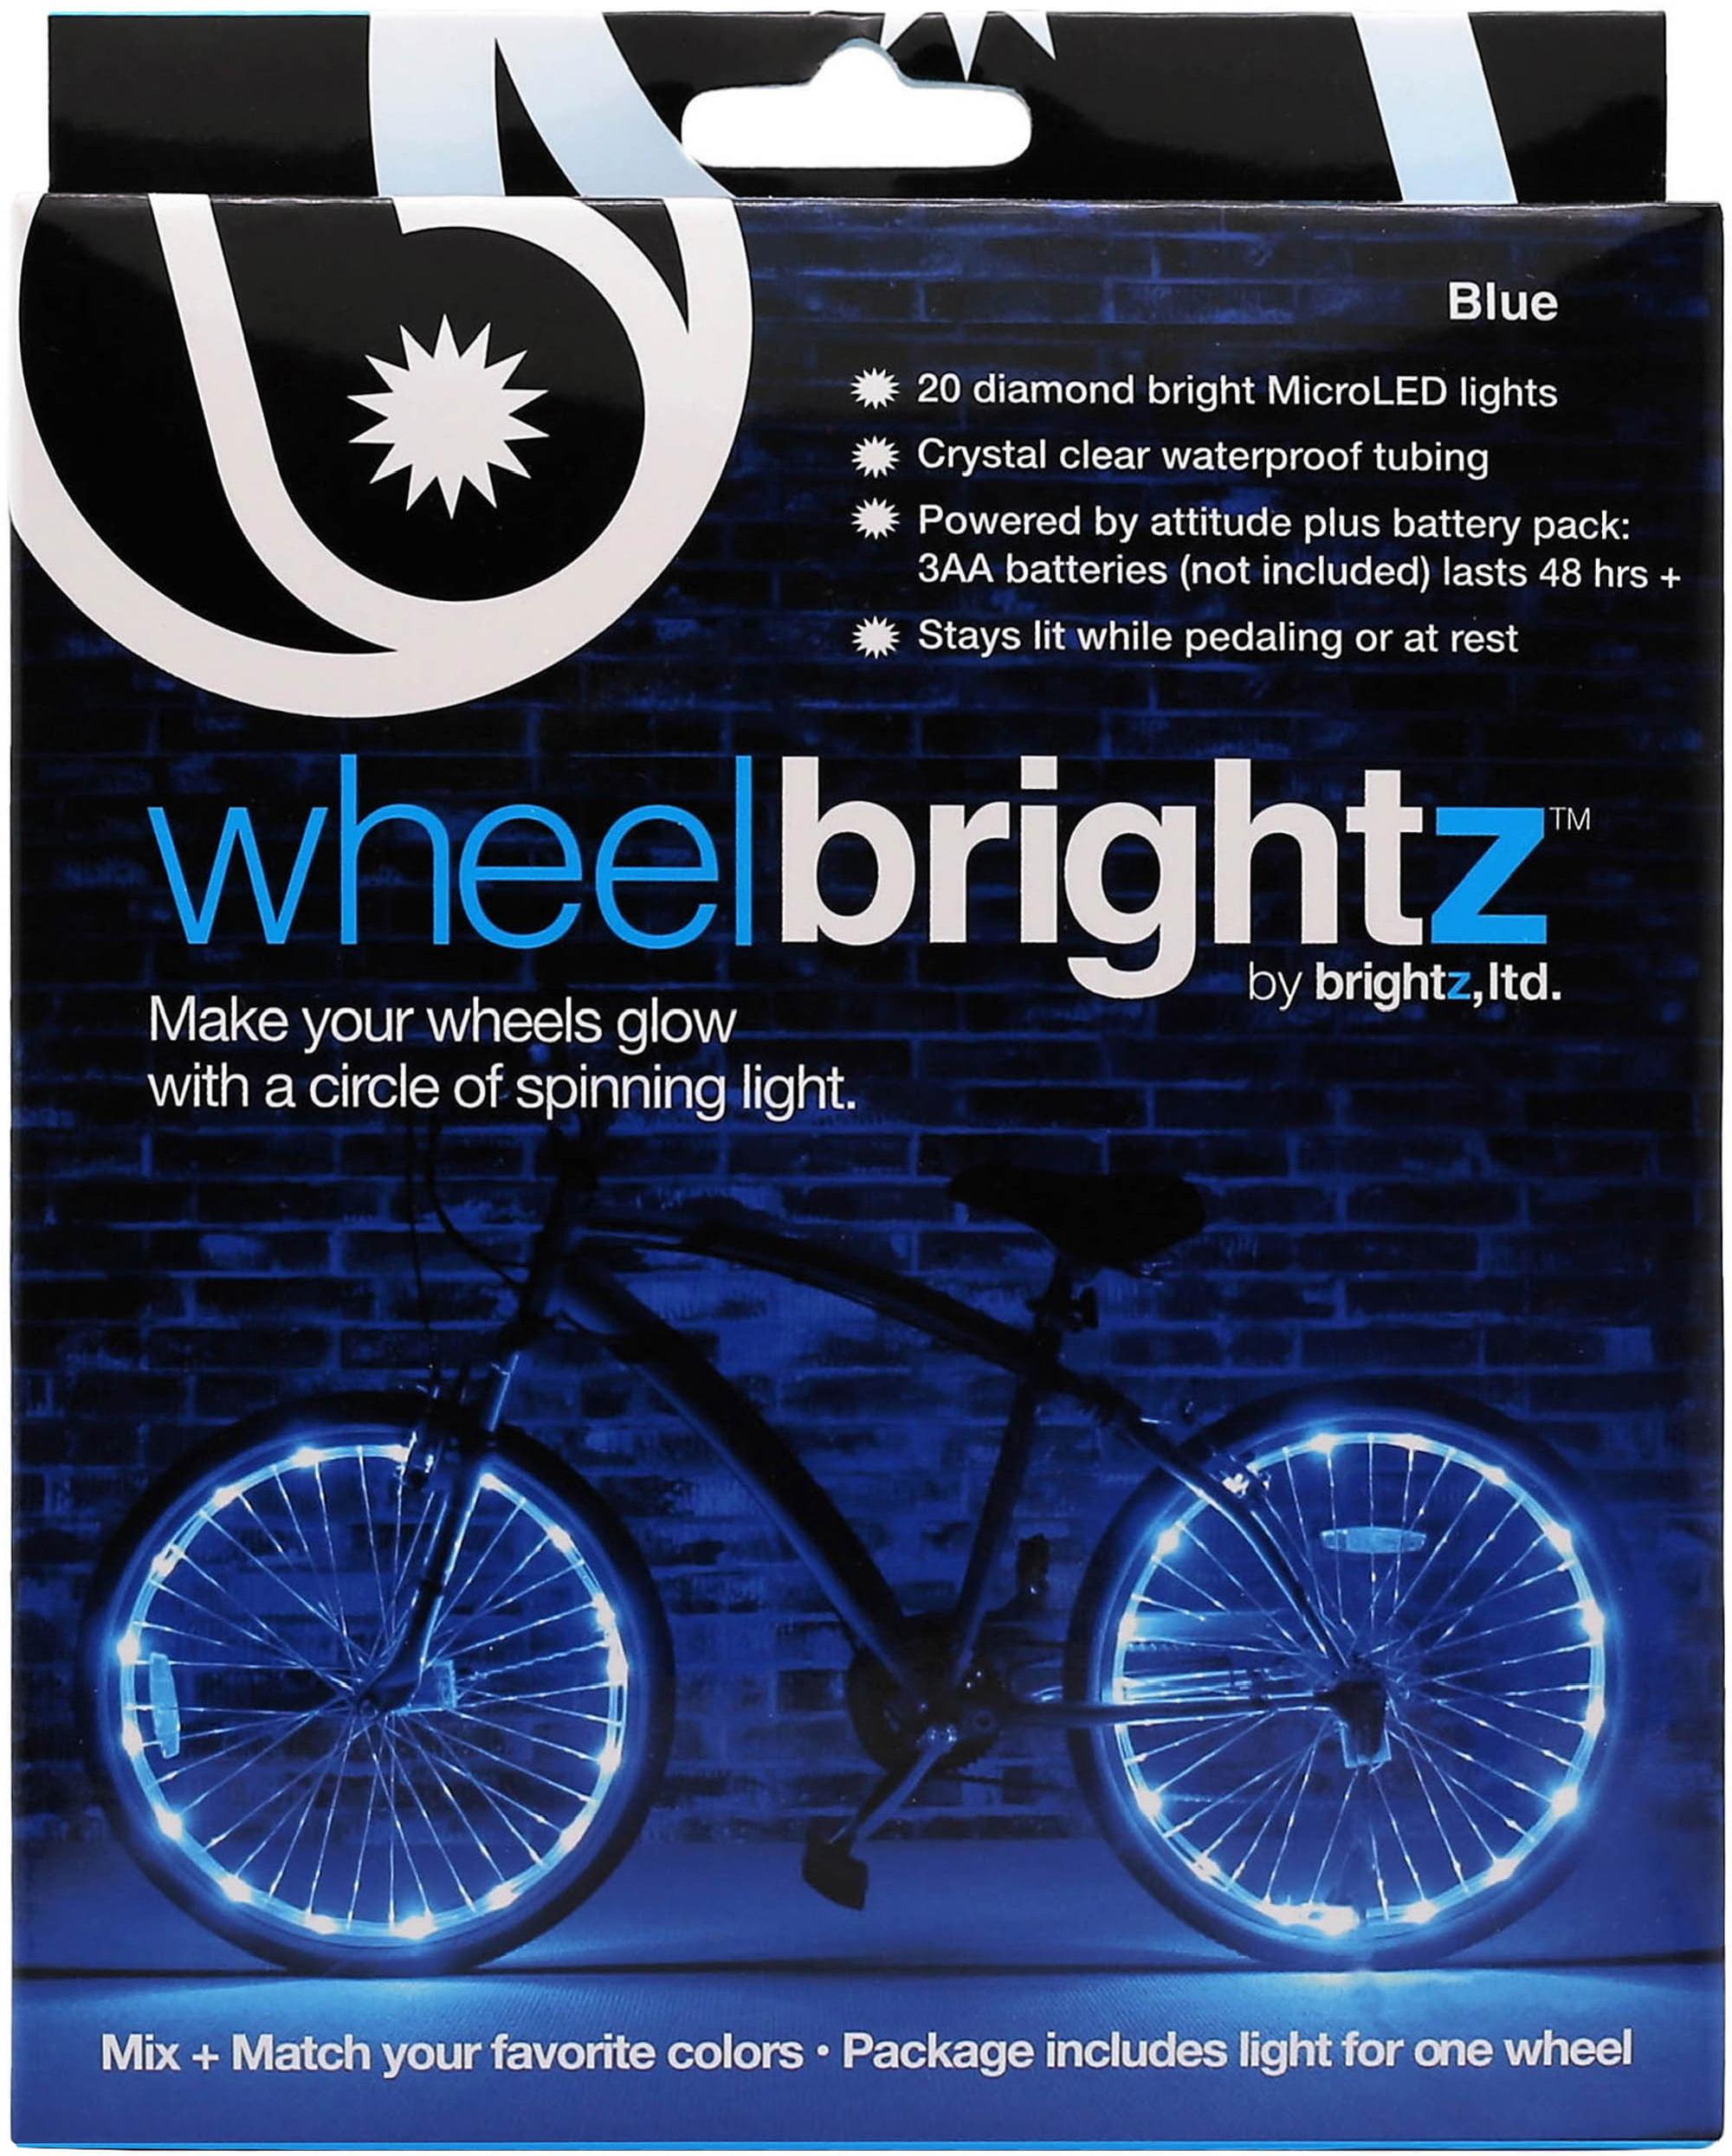 Brightz, Ltd. Blue Wheel Brightz LED Bicycle Wheel Accessory (For 1 ...